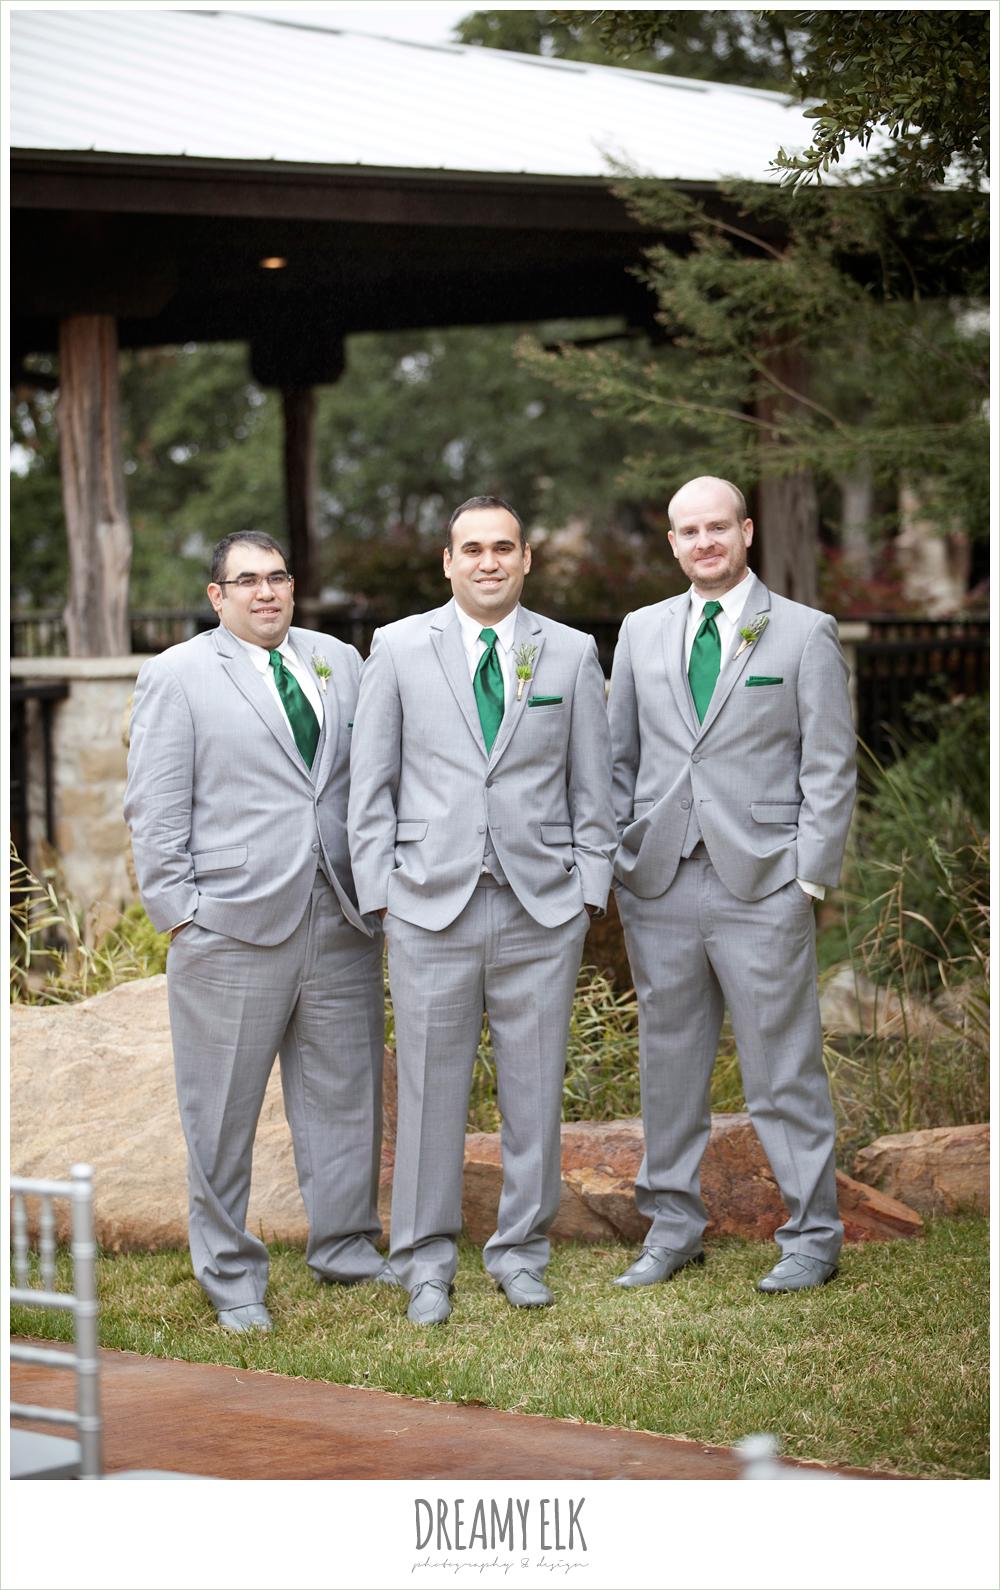 groom and groomsmen in gray suits, winter vineyard wedding, dreamy elk photography and design